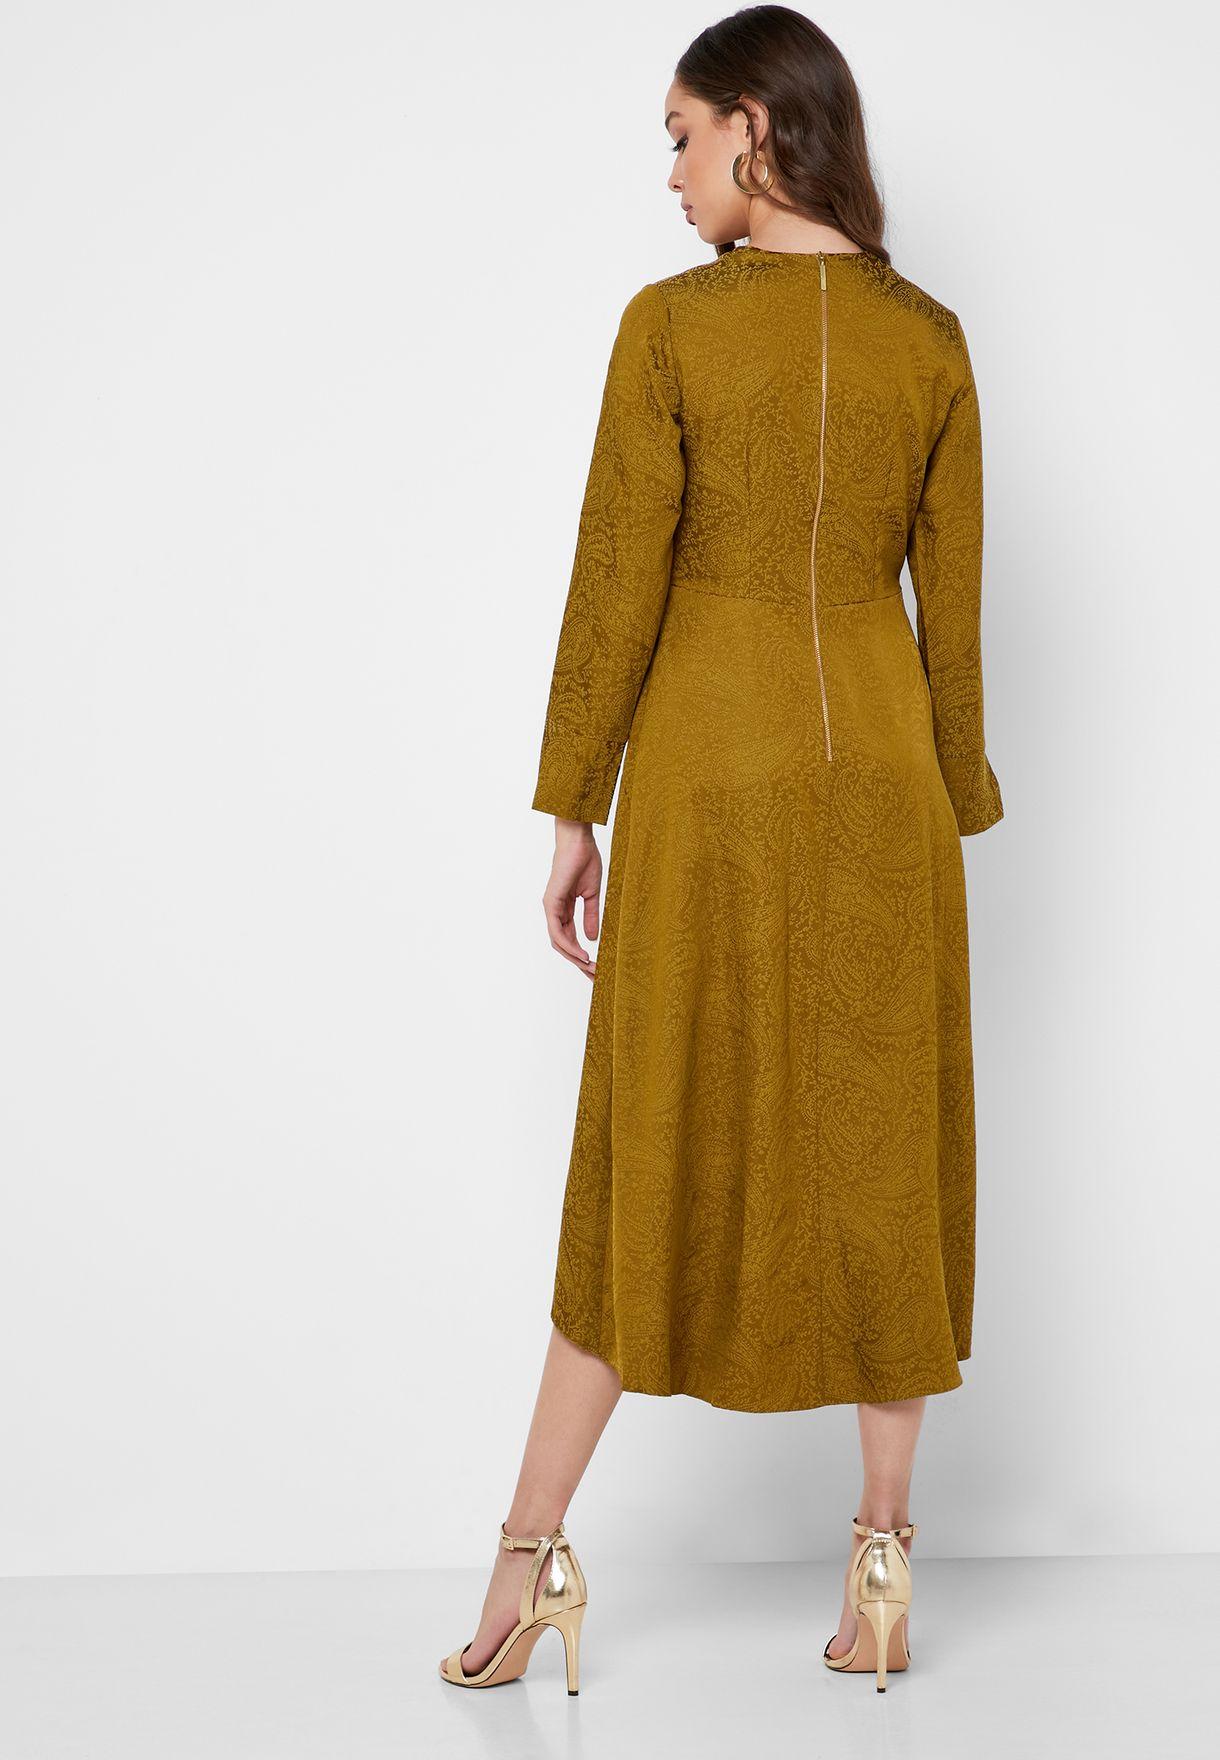 High Low Slit Sleeve Jacquard Dress